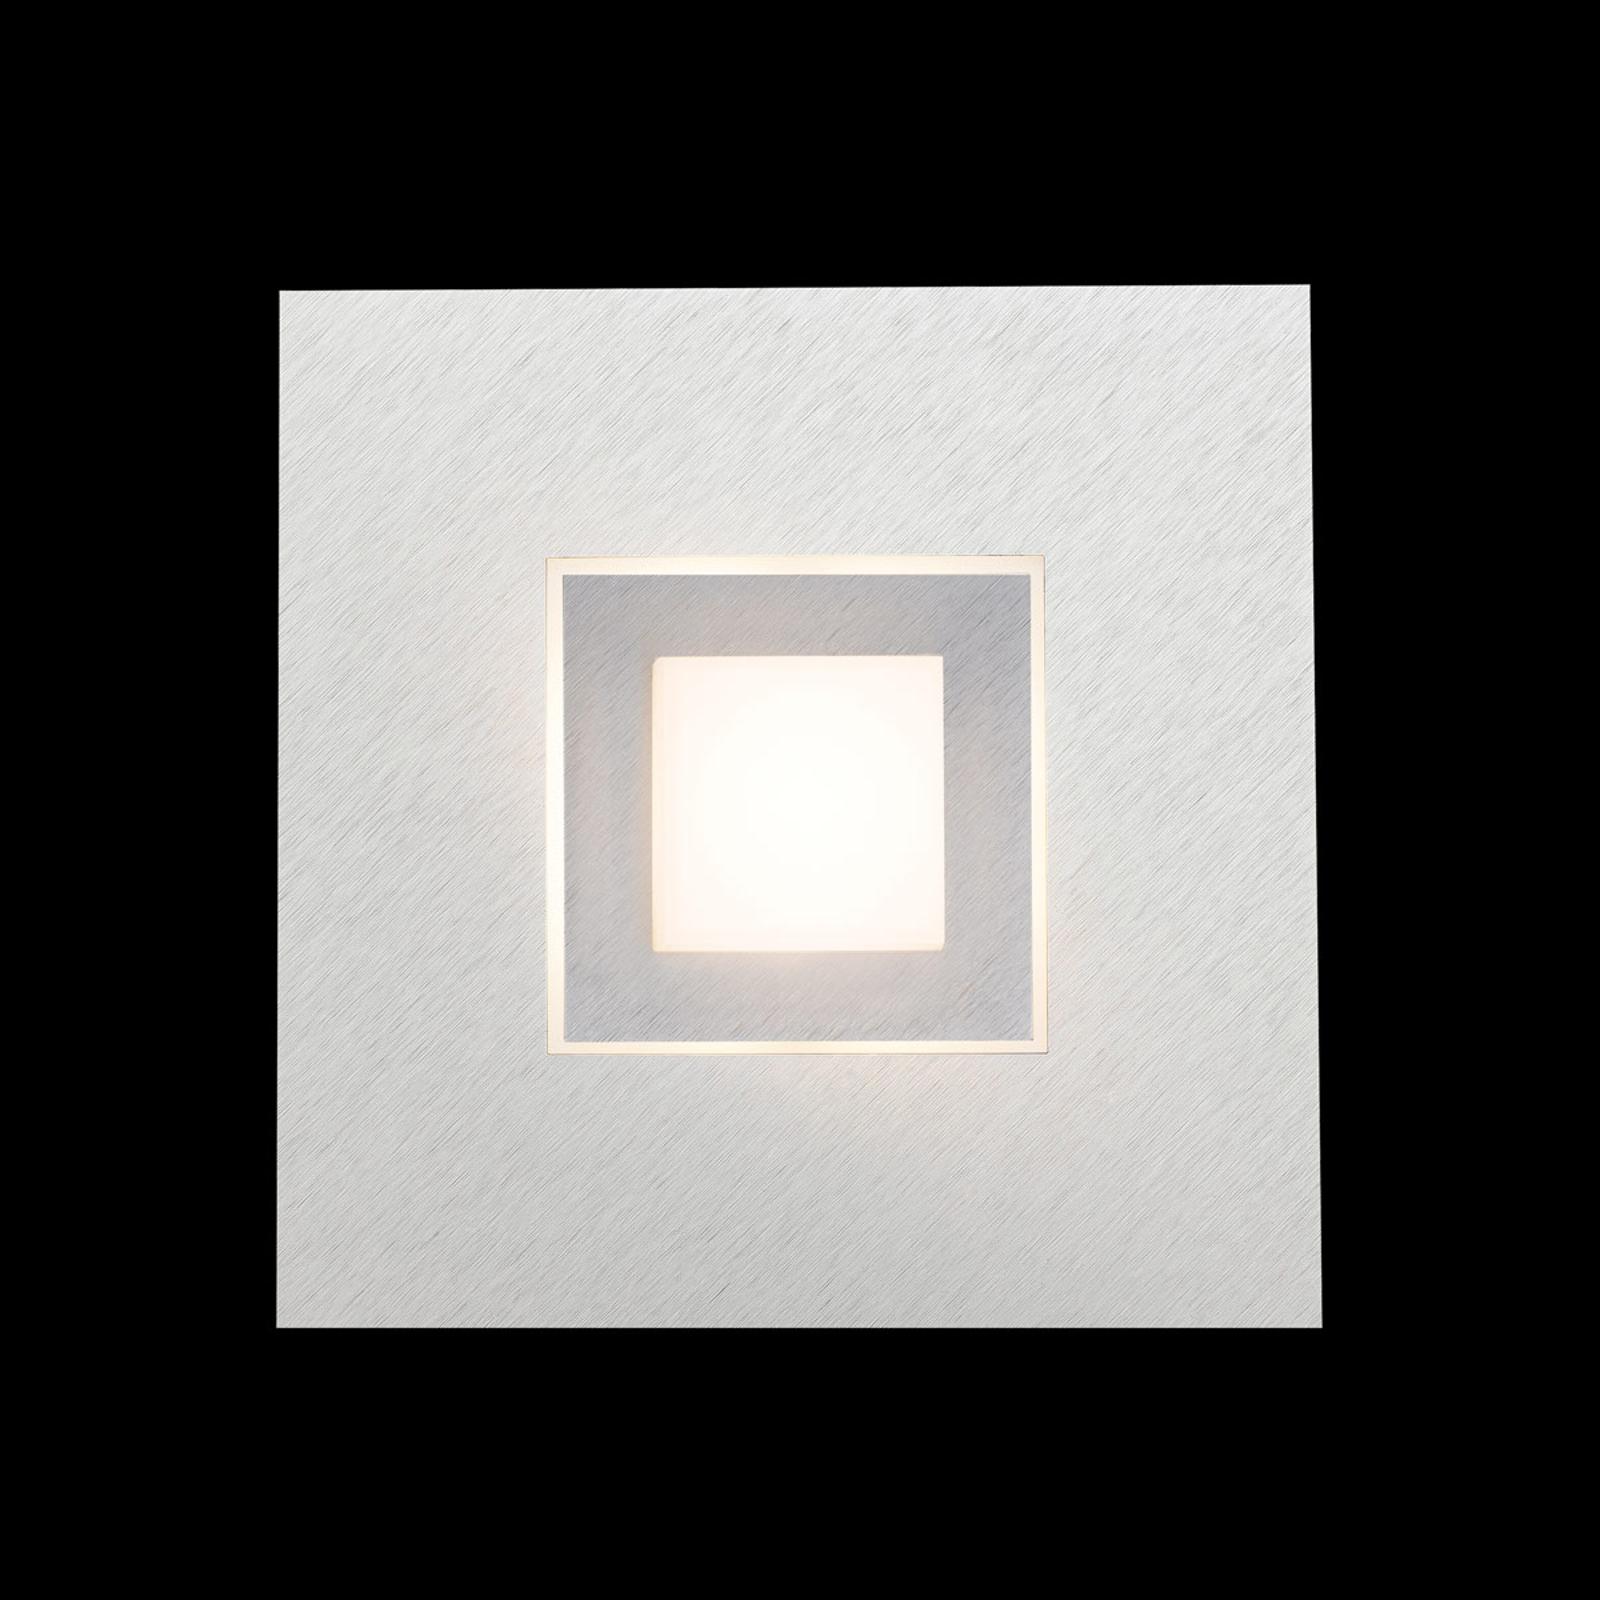 GROSSMANN Karree LED-Wandleuchte, titan